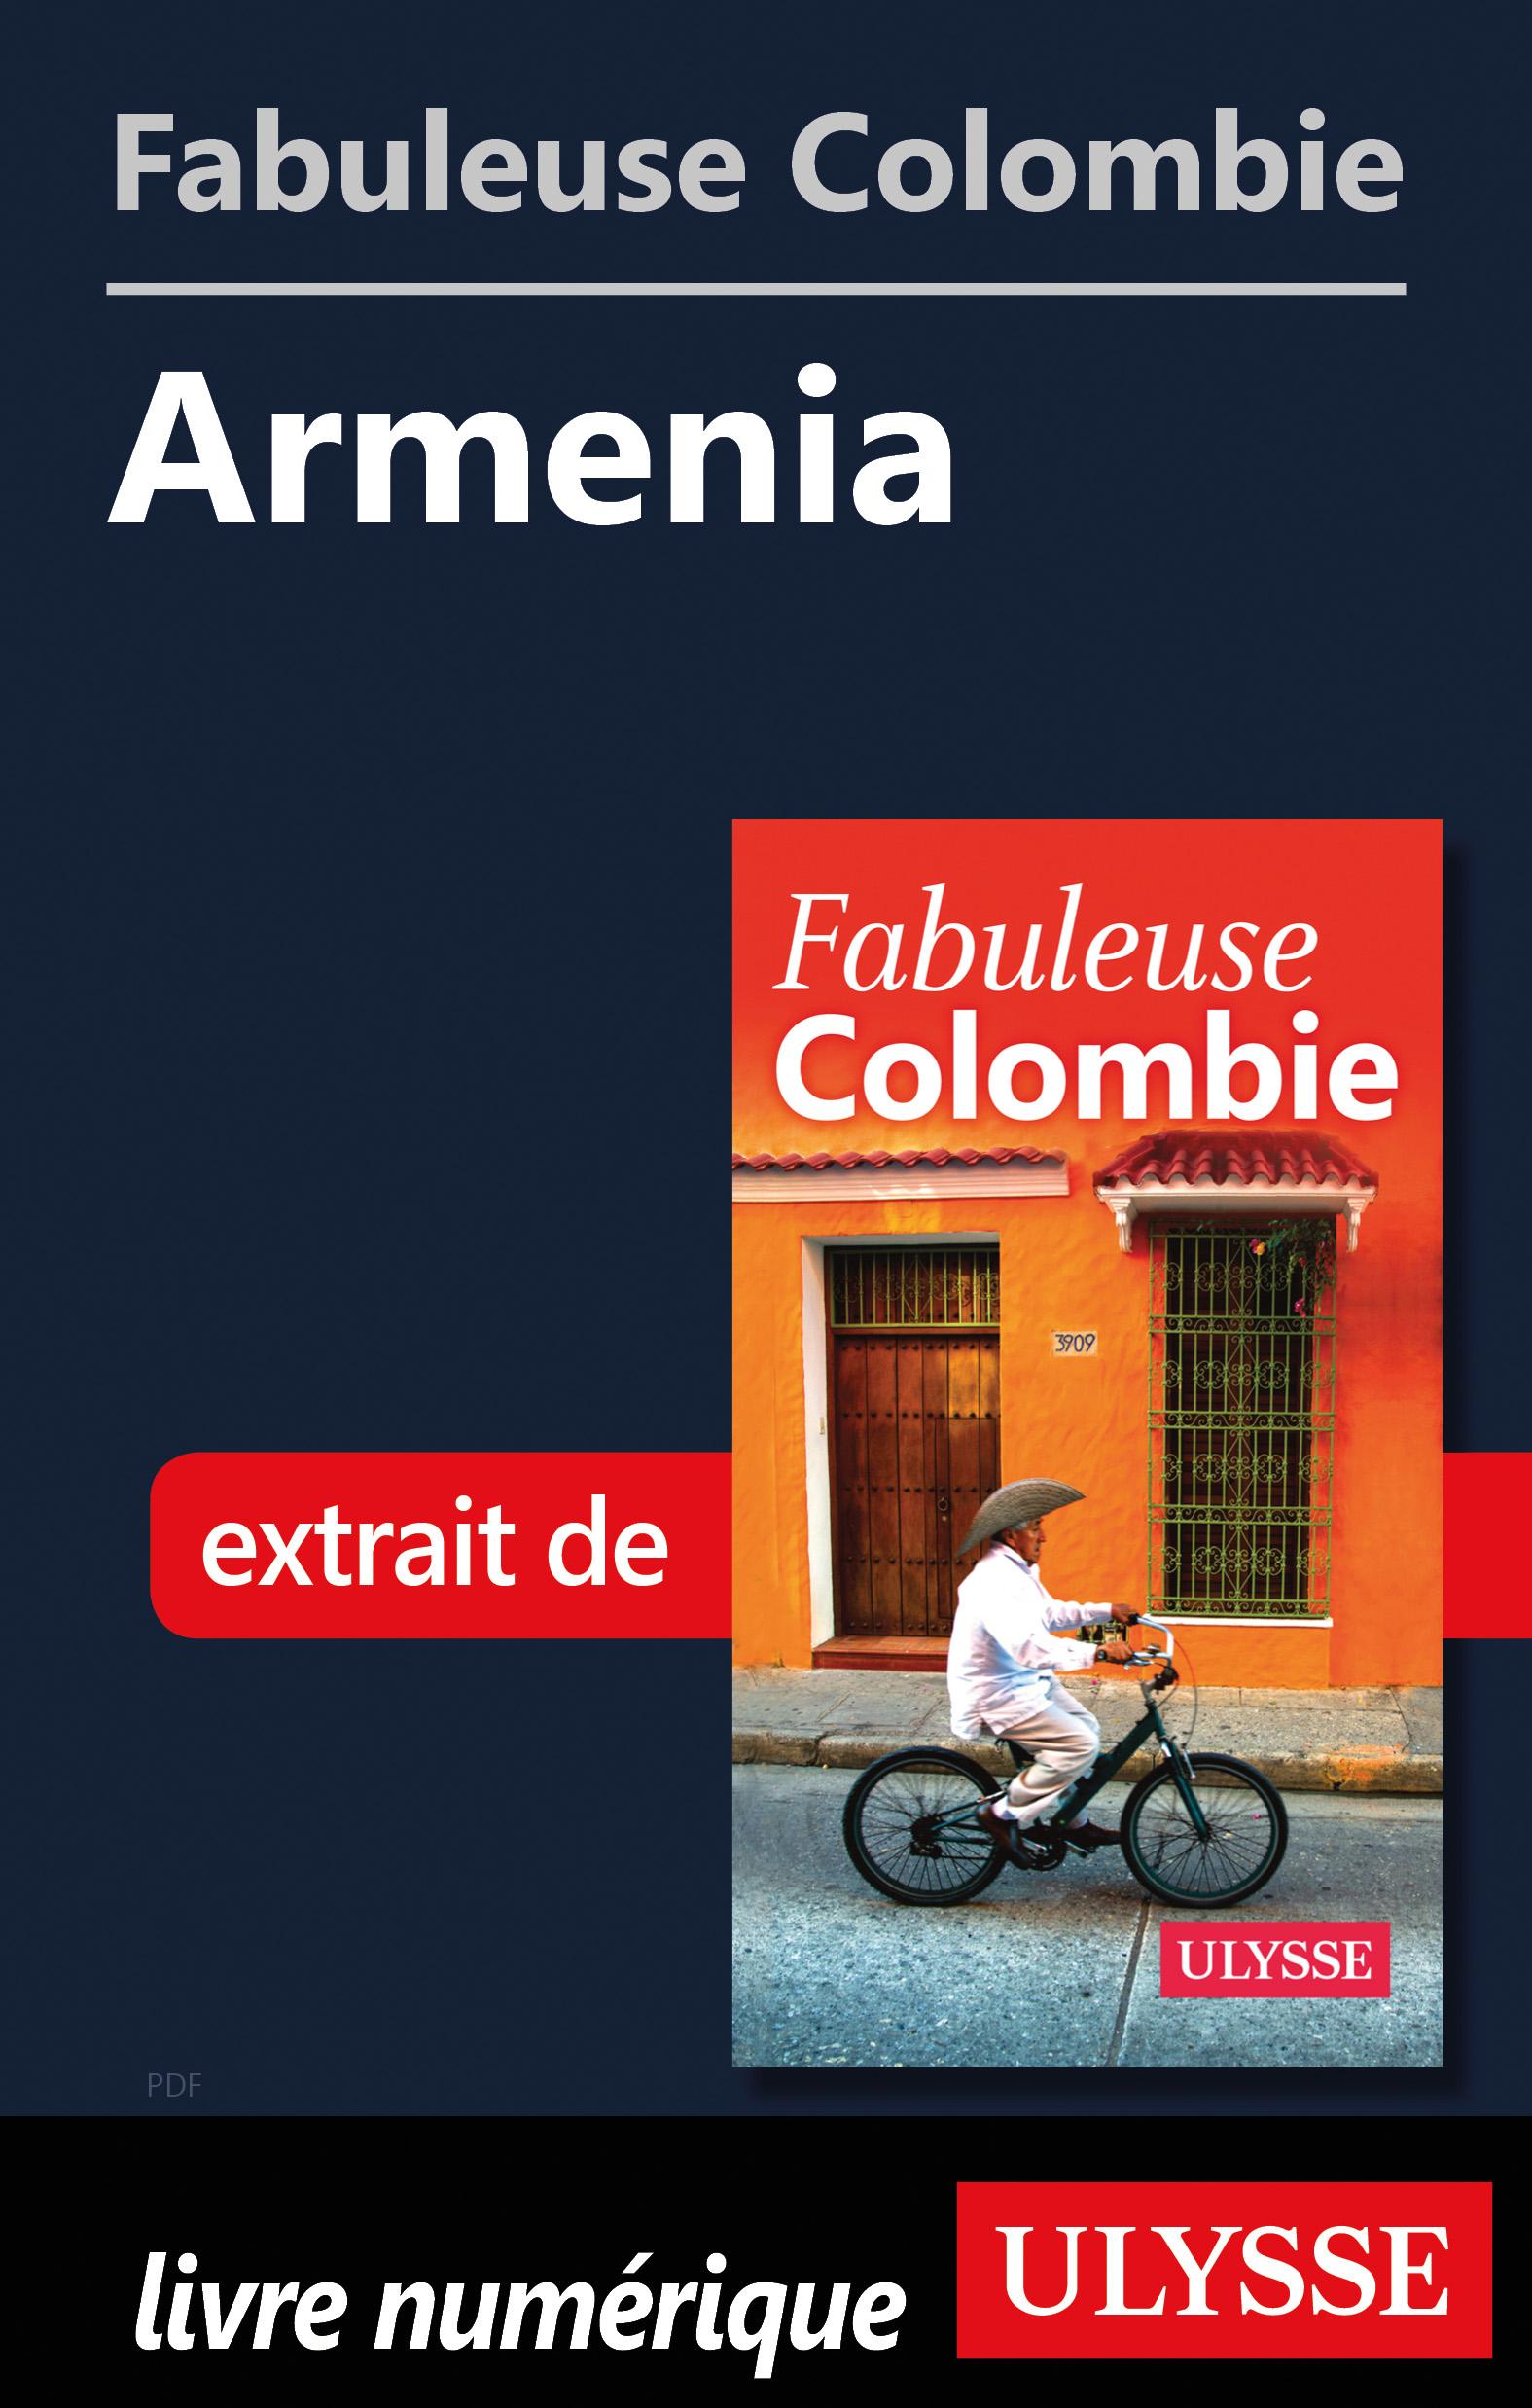 Fabuleuse Colombie: Armenia